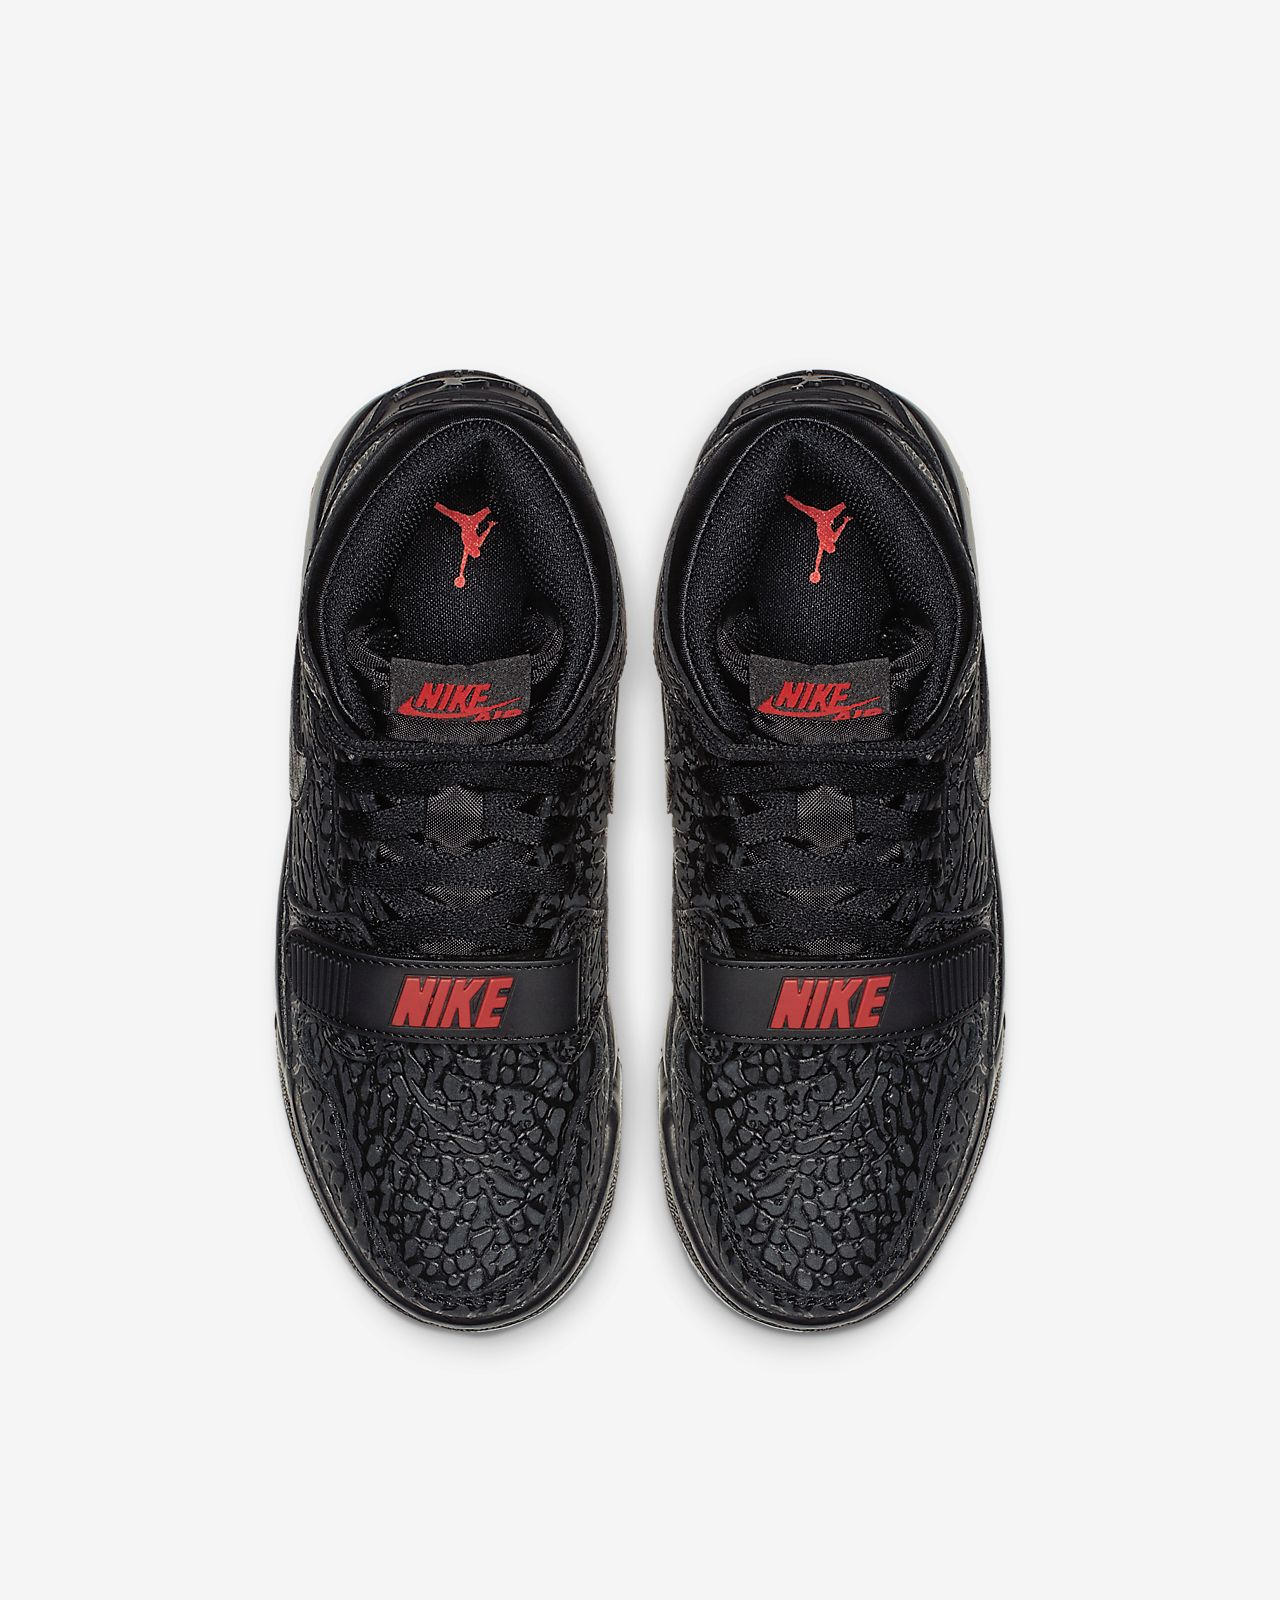 5a97188a8fc8 Air Jordan Legacy 312 Older Kids  Shoe. Nike.com AU